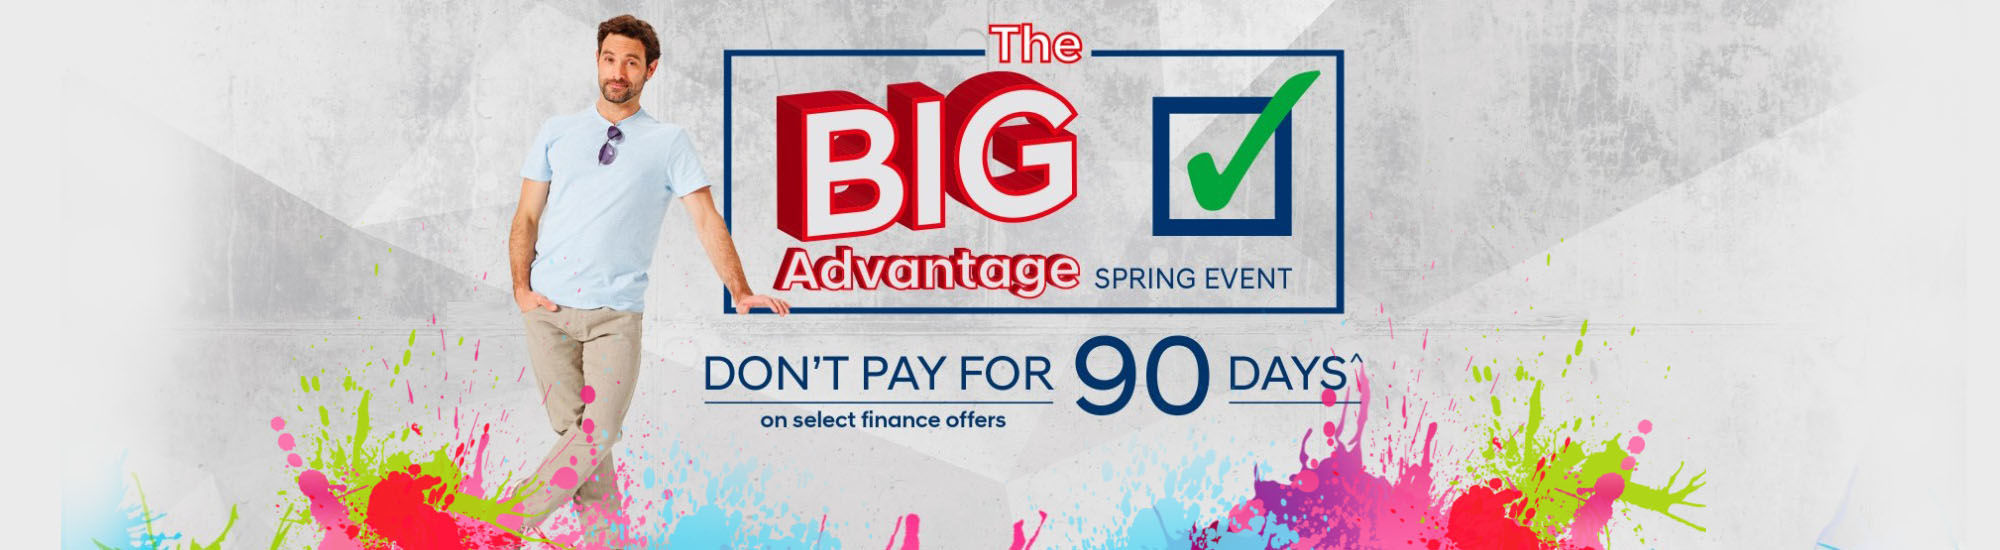 The big advantage spring event